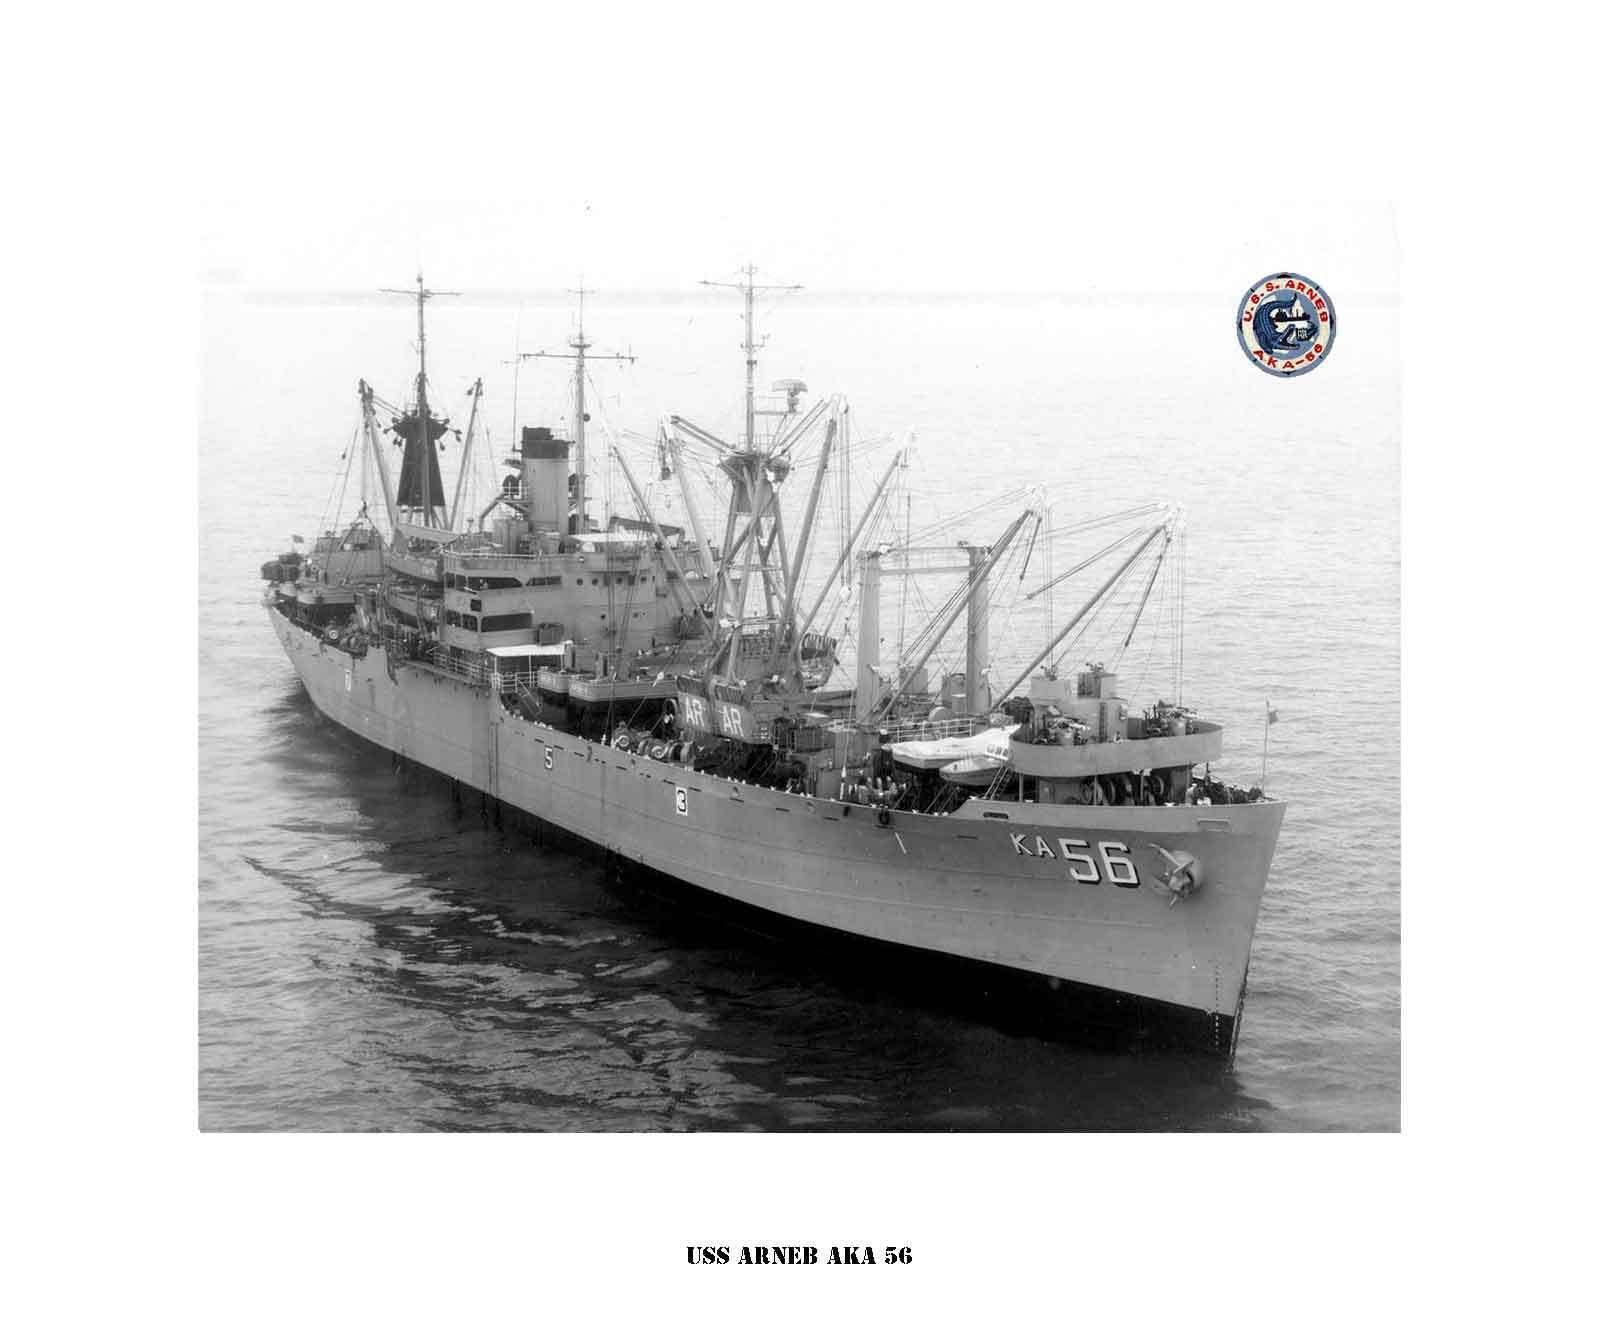 USS ARNEB AKA 56 , US Naval Ship,  USN Navy Photo Drucken